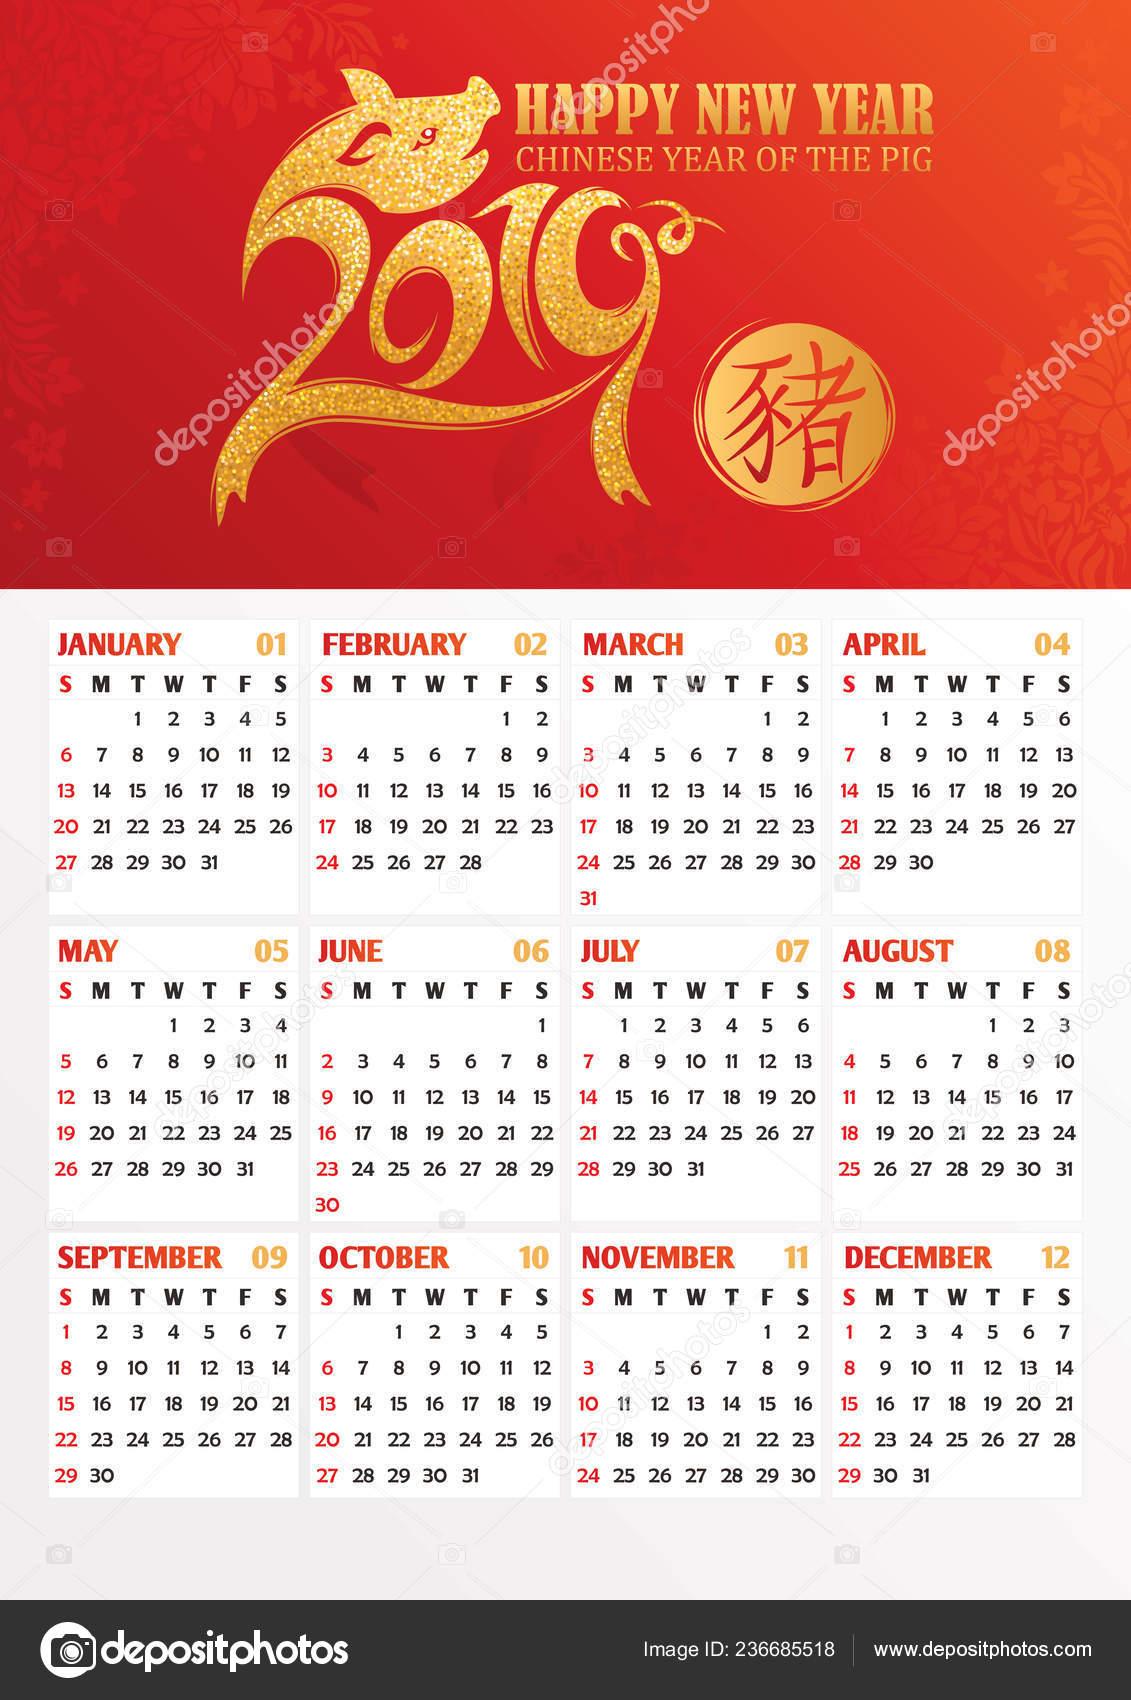 Calendrier Traduction.Calendrier Annee 2019 Avec Symbole Chinois Annee Cochon